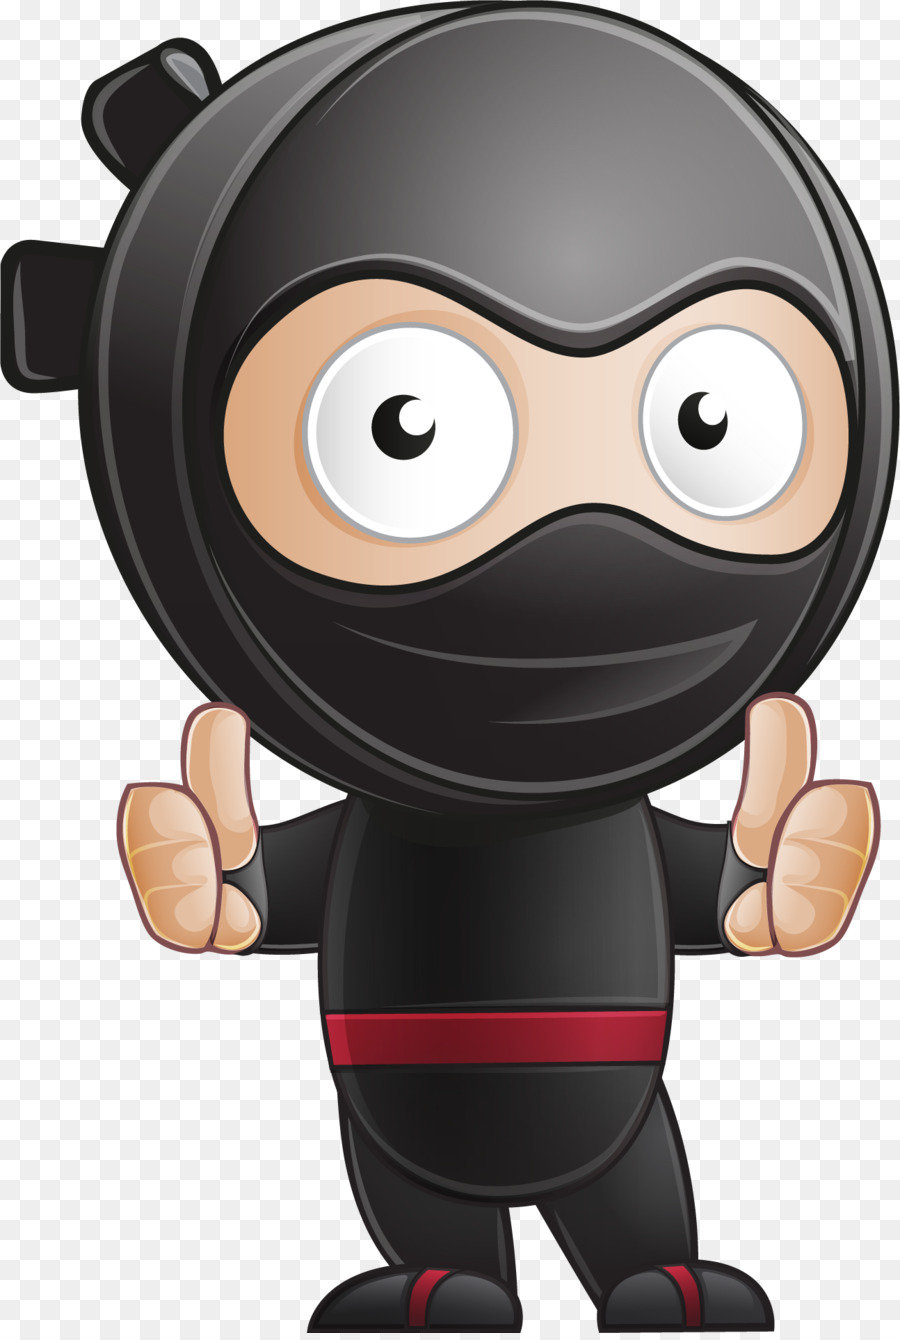 87+ Gambar Animasi Keren Ninja Paling Hist